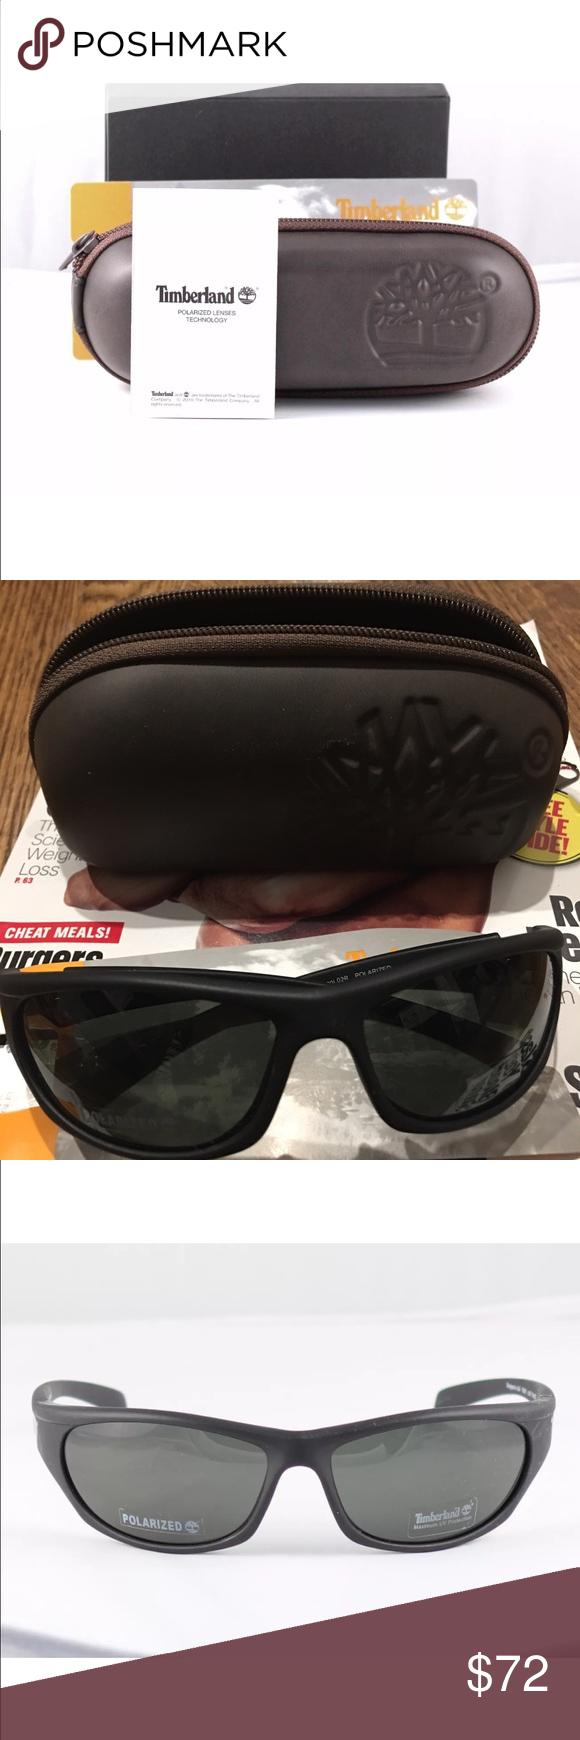 fbb9833f6e NWT Black Timberland Wrap Sunglasses MEN s SALE! NWT Authentic Timberland  Sunglasses Model  TB 9507 Color  black 02R size  63-16-130 Retail  89- 119  PRICE ...